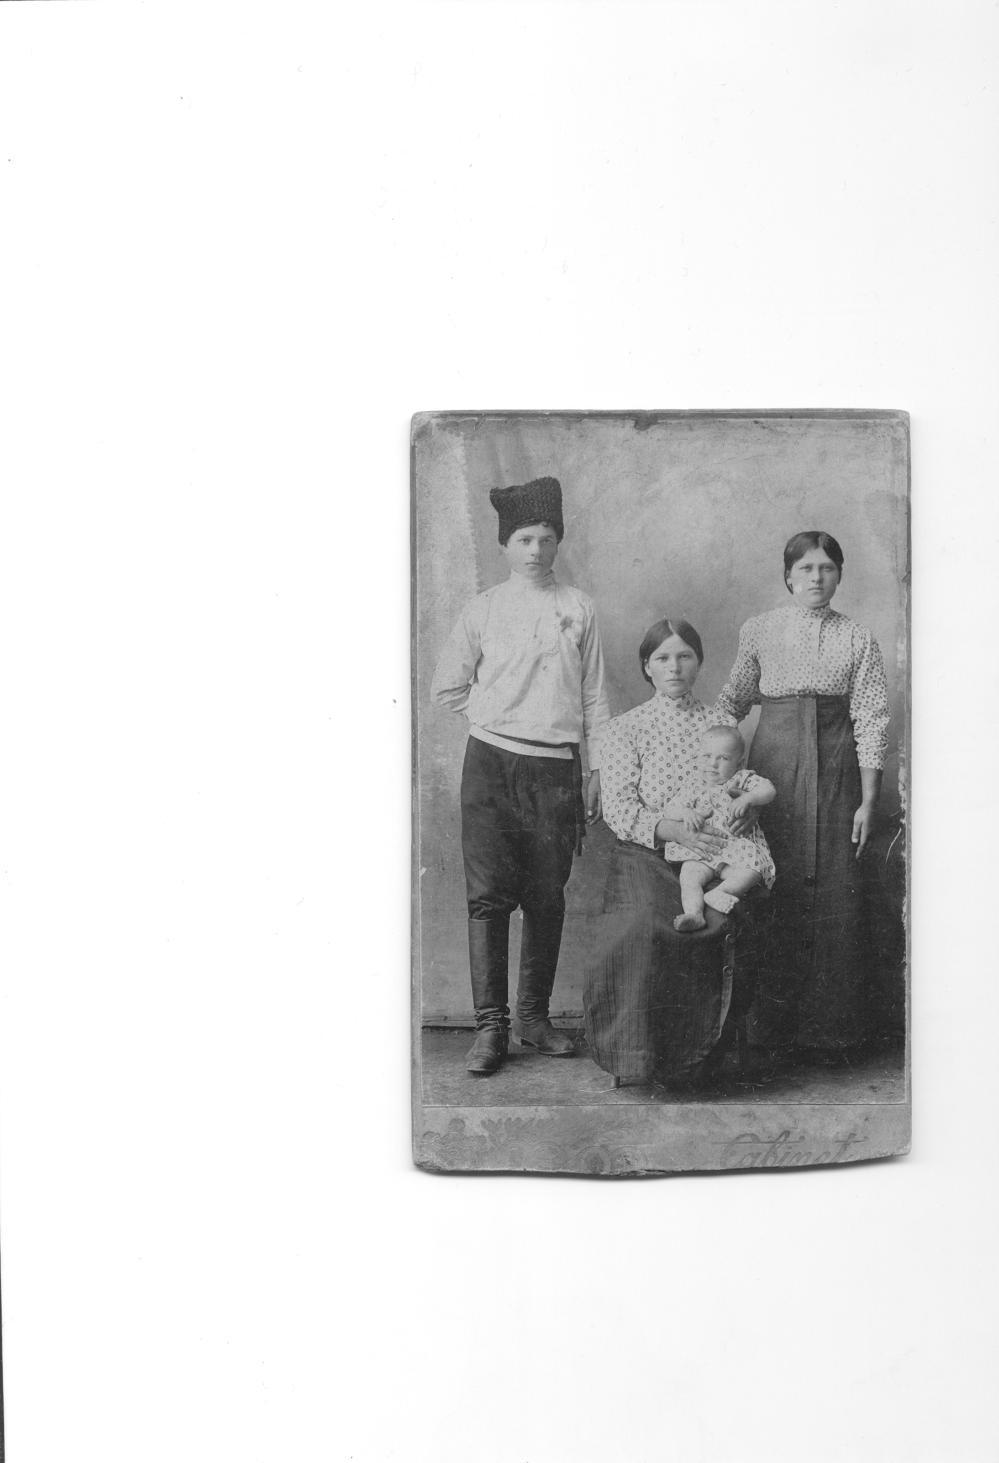 C:\Documents and Settings\Валентина Григорьевн\Мои документы\Семья нир\фото нип семья н0006.tif